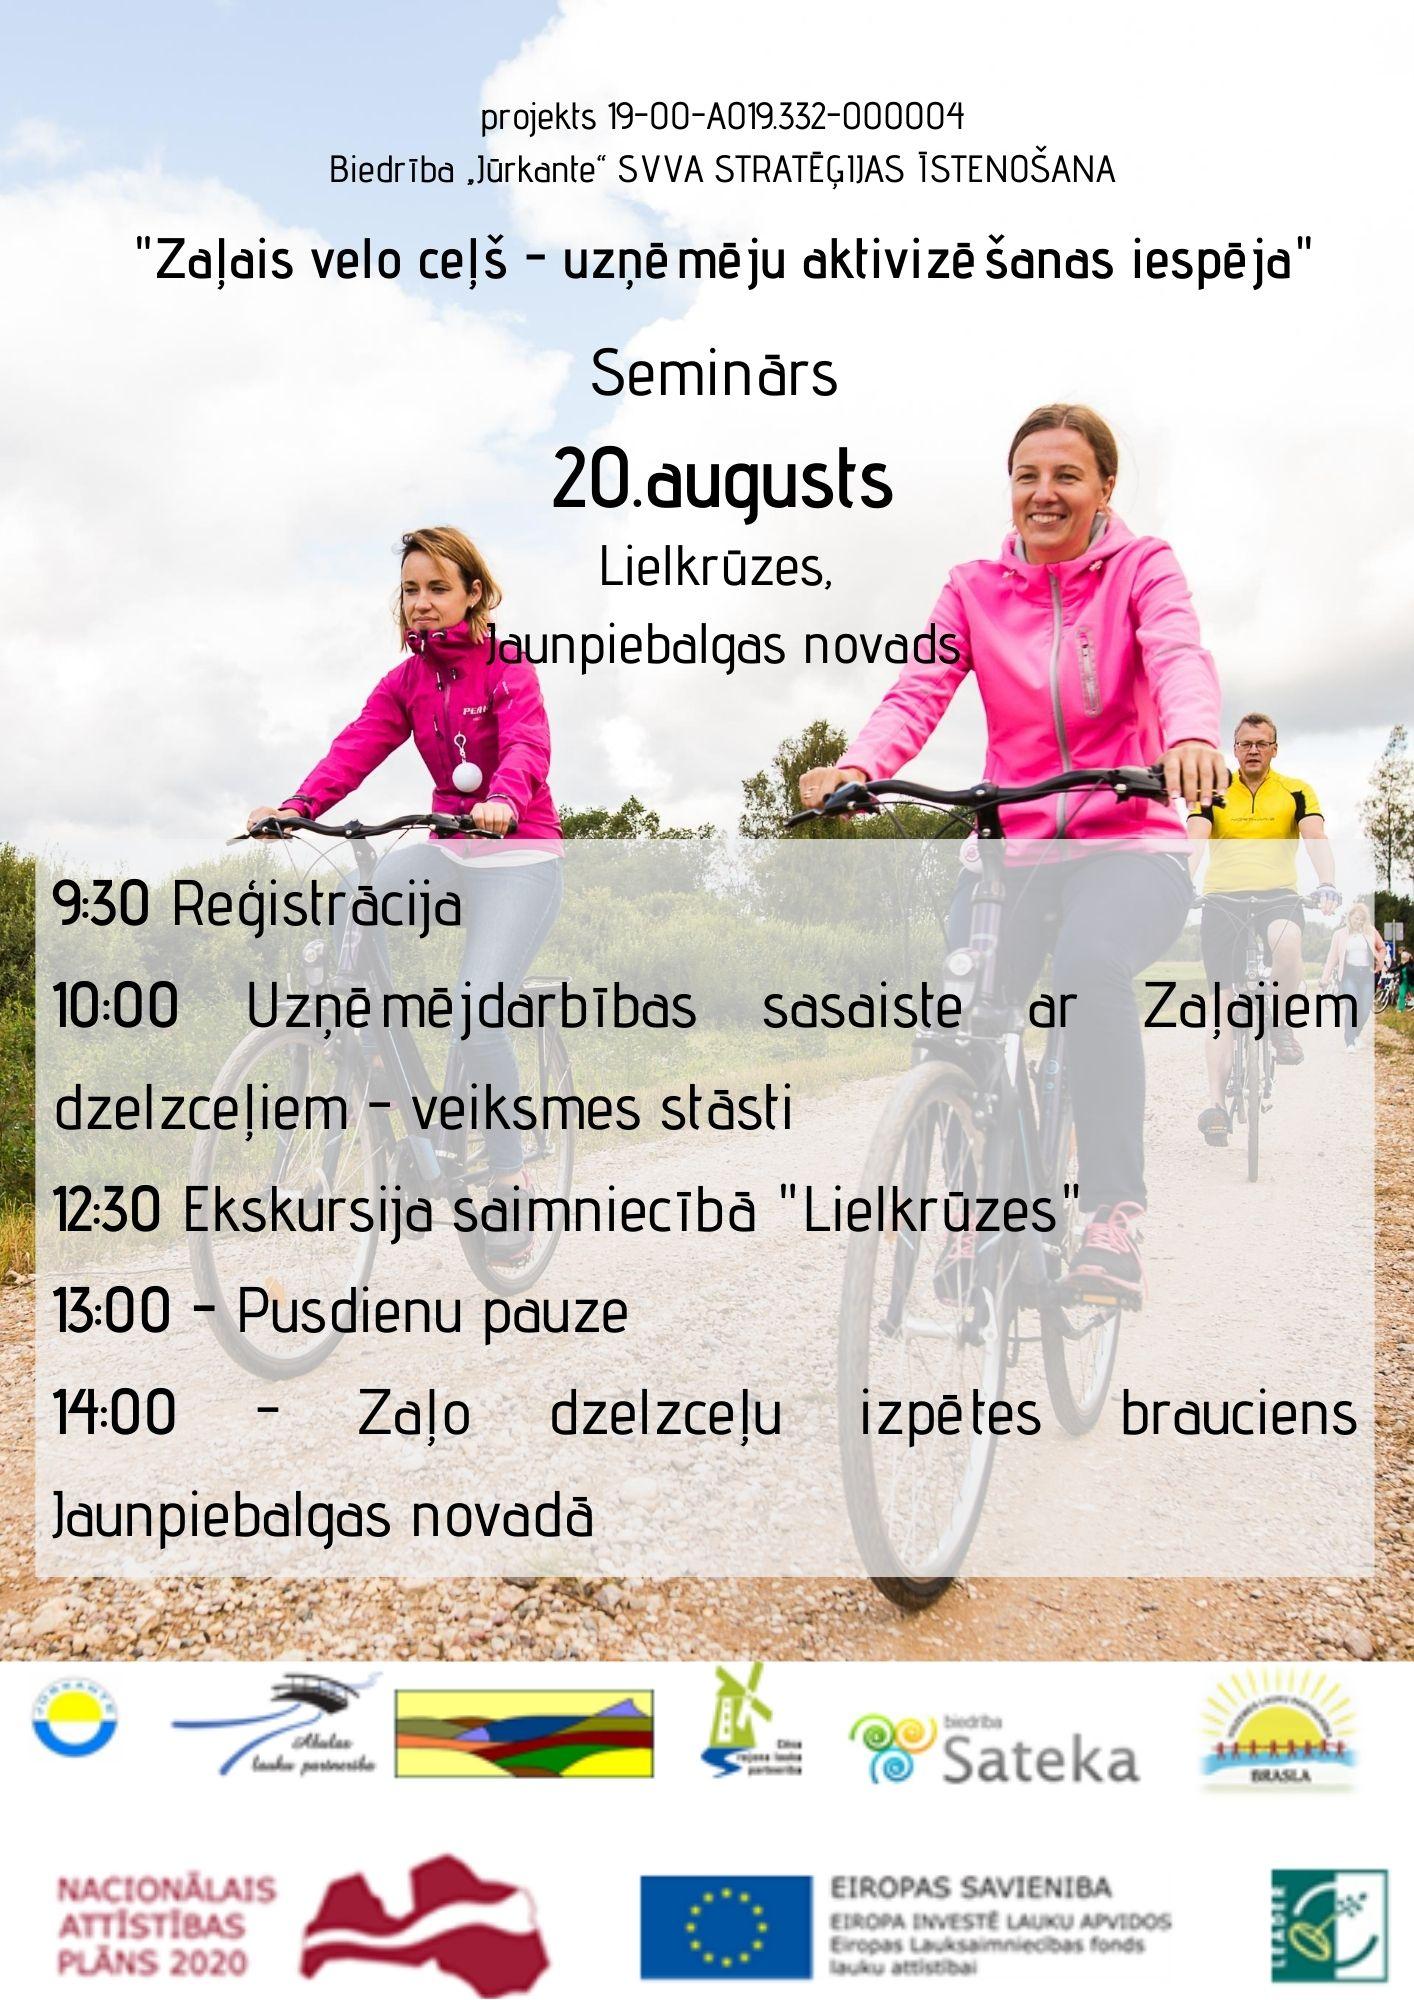 Afisa_20.08.2020_Seminars _Lielkruzes.JPG